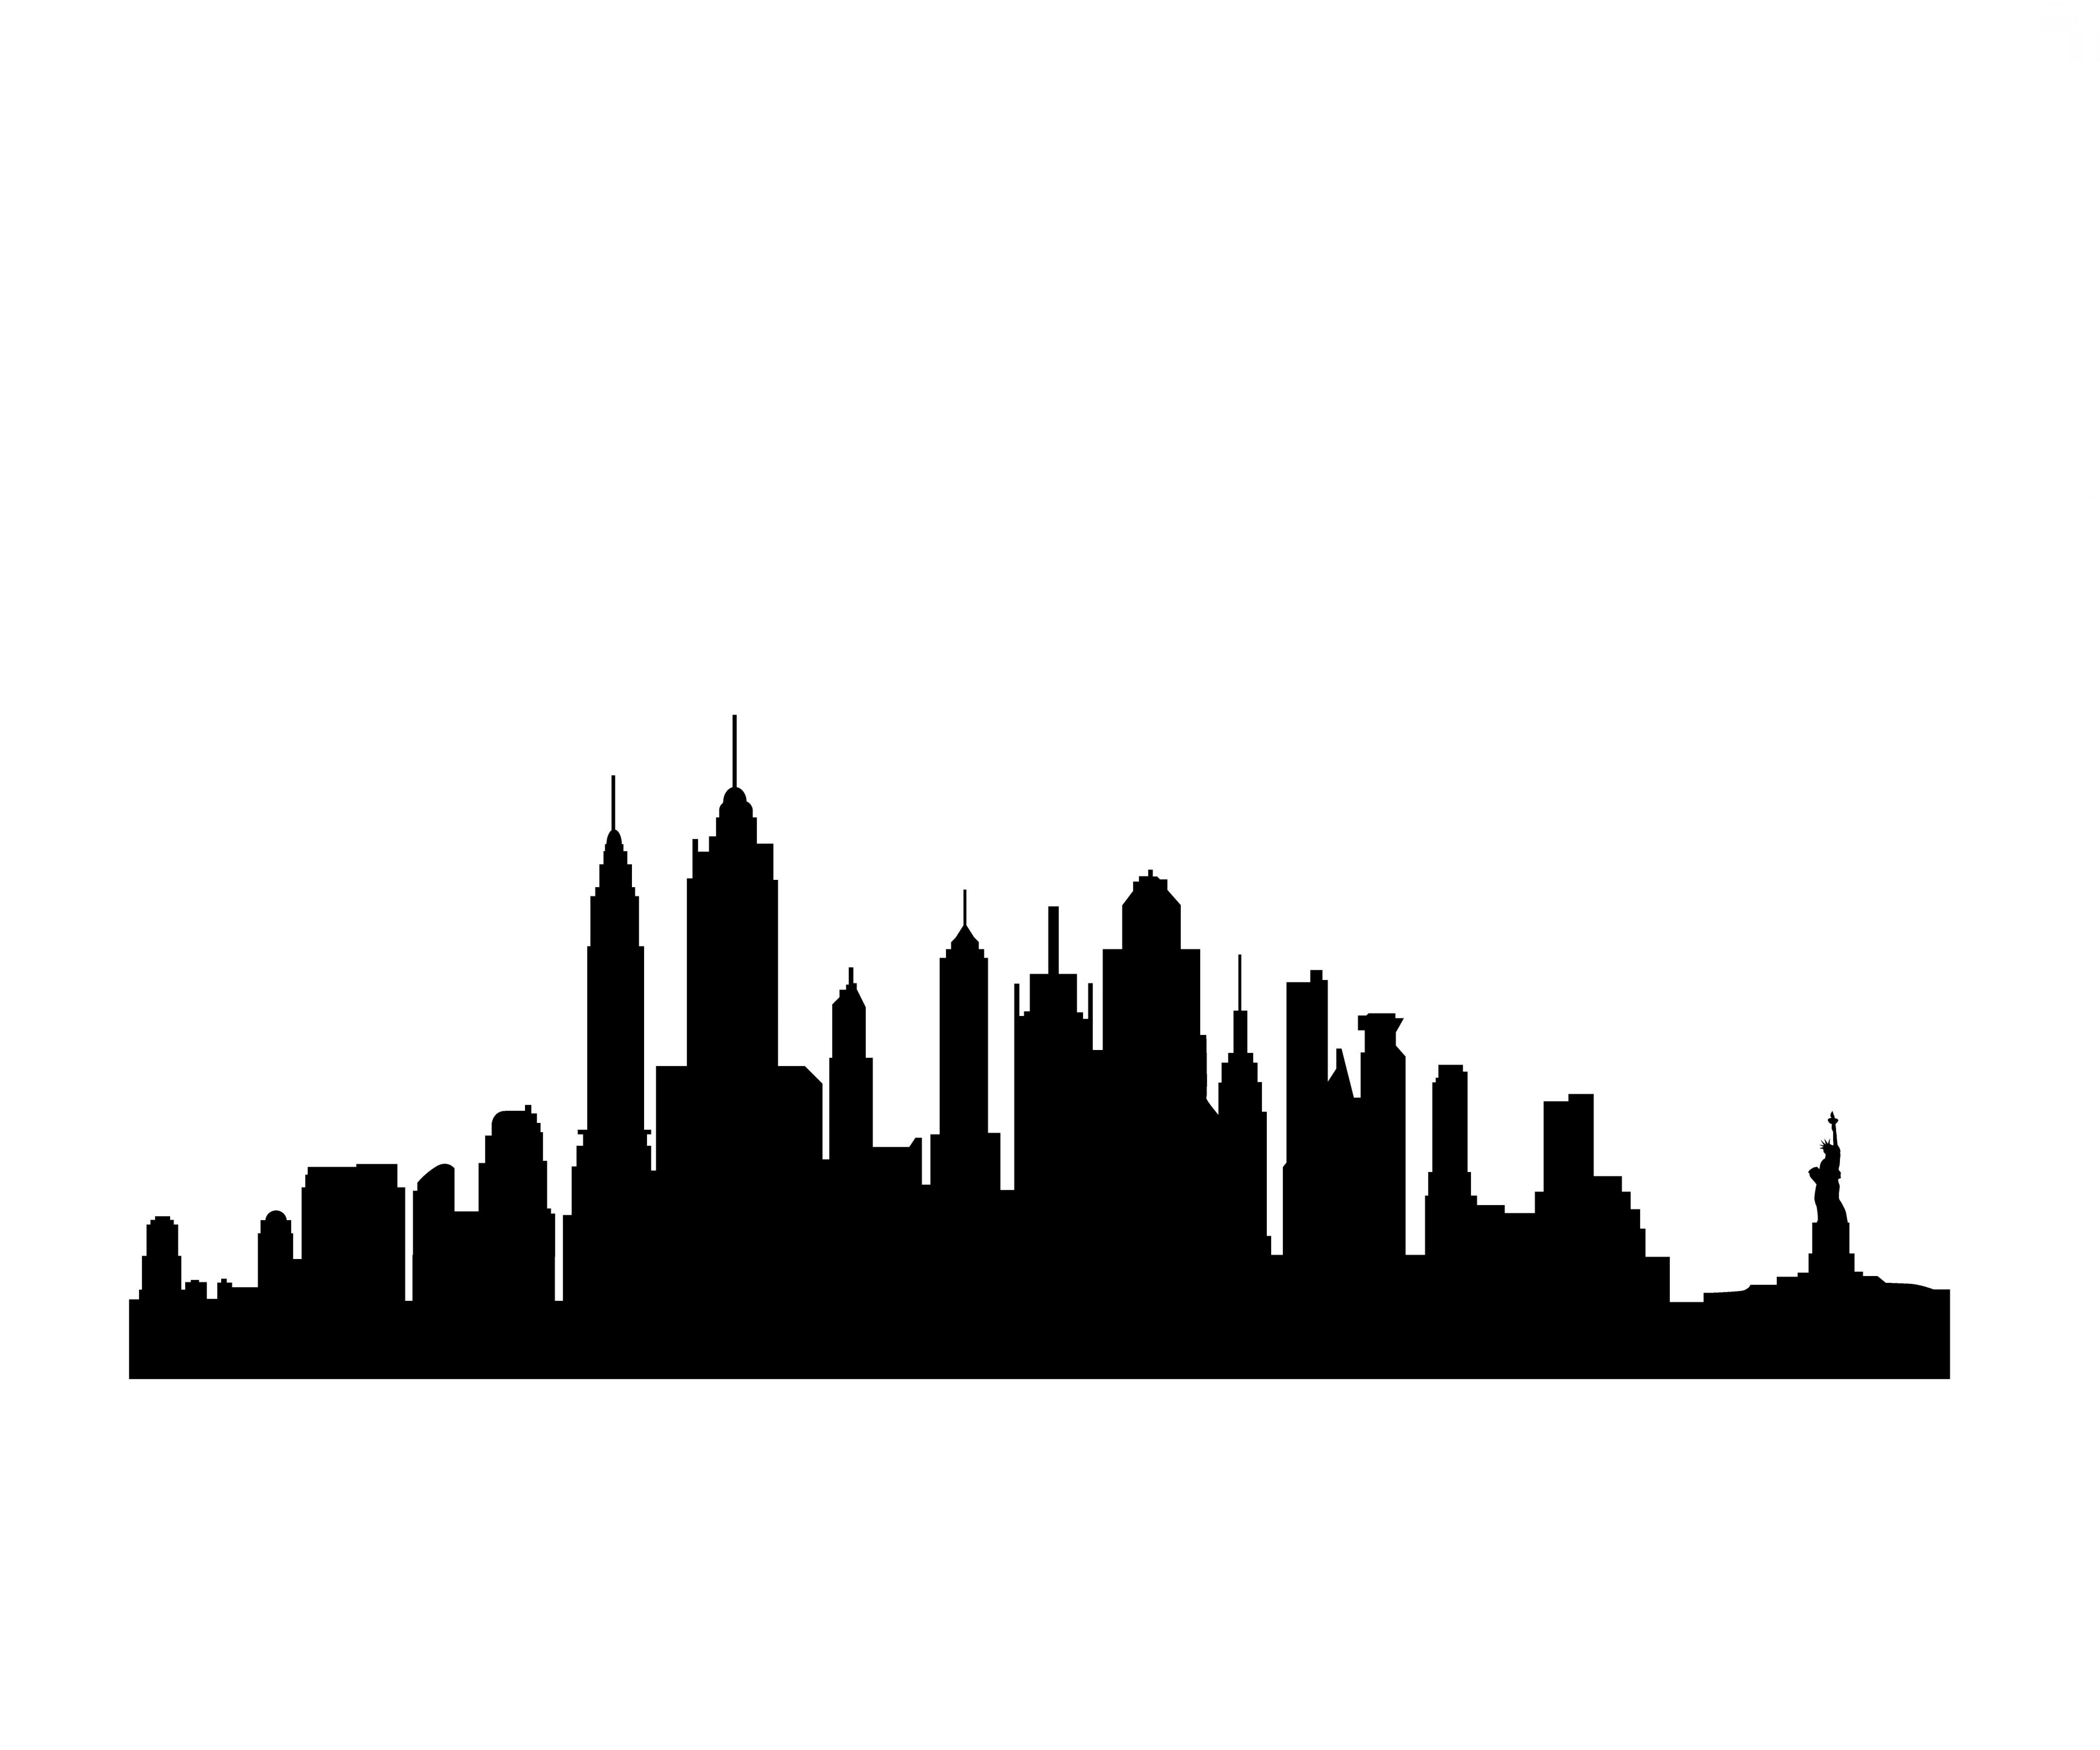 5184x4320 Dazzling City Skyline Clipart Rgesthuizen Clip Art Free Vector